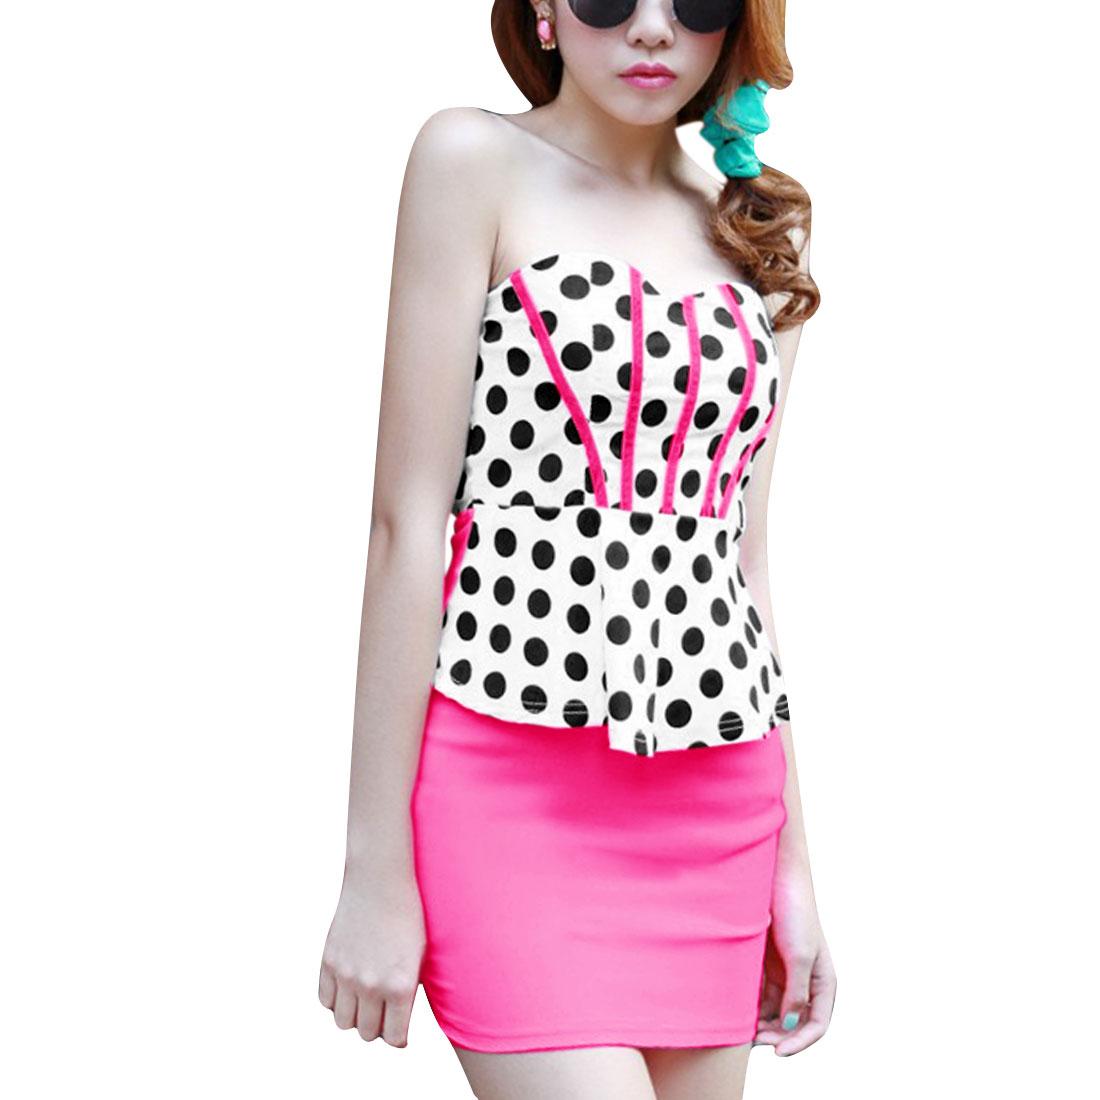 Women Sleeveless Color Block Chic Mini Dress Hot Pink White XS